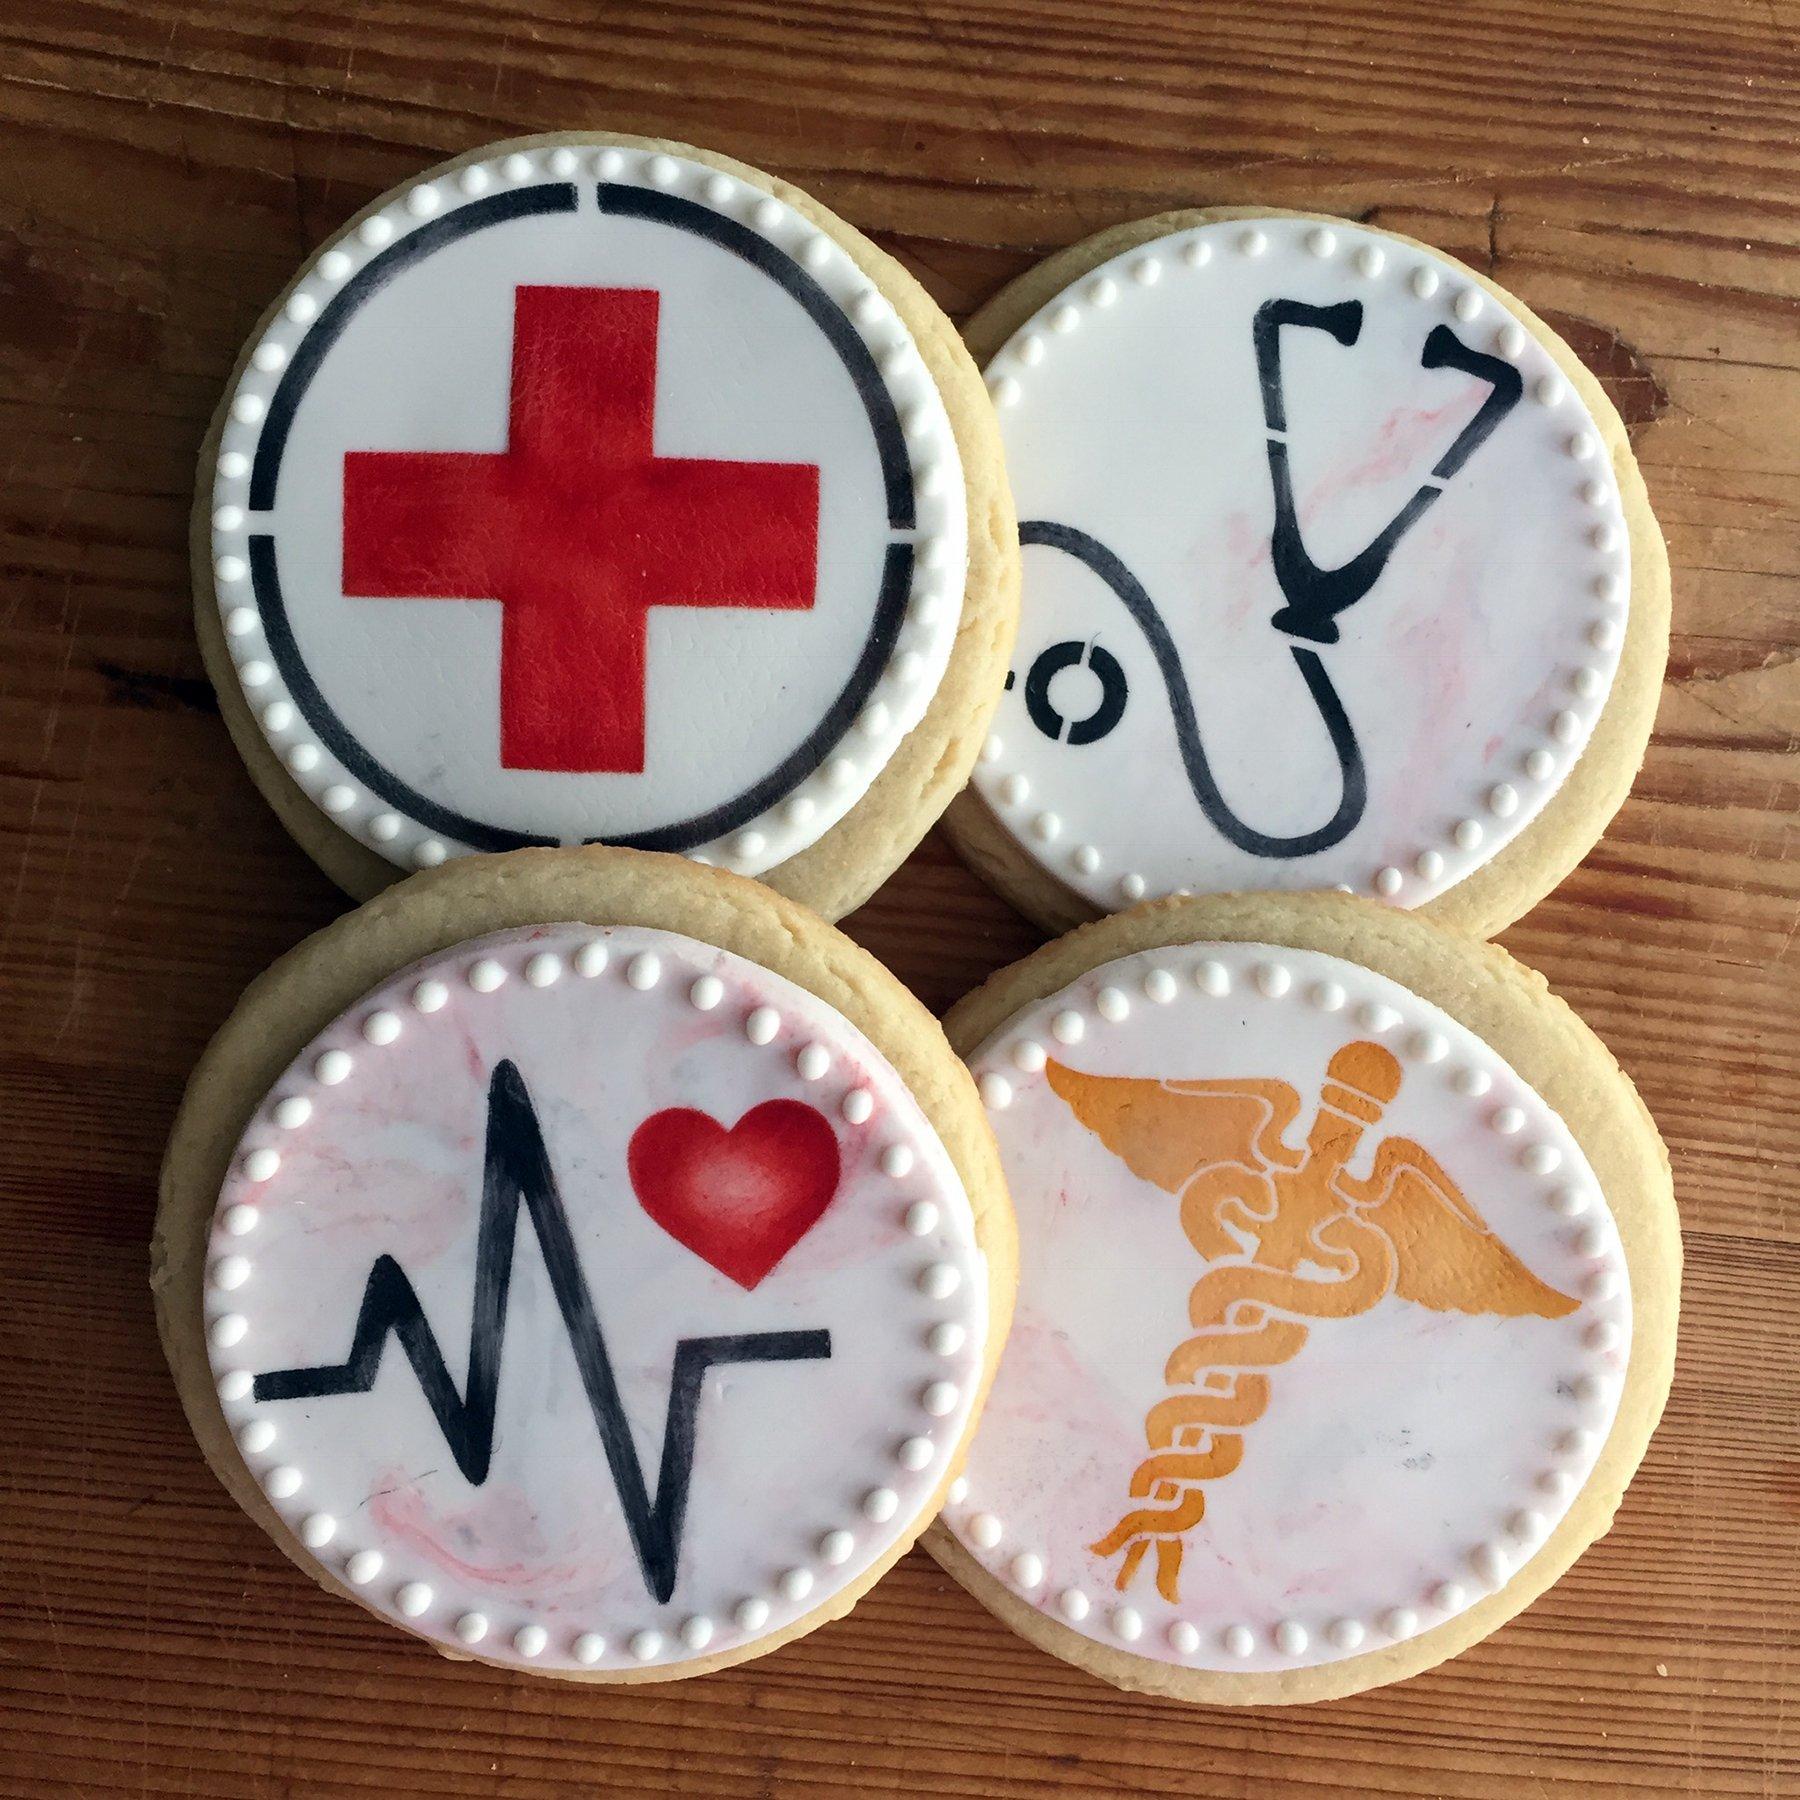 Medical Symbols Cookie Stencil Set C992 By Designer Stencils by Designer Stencils